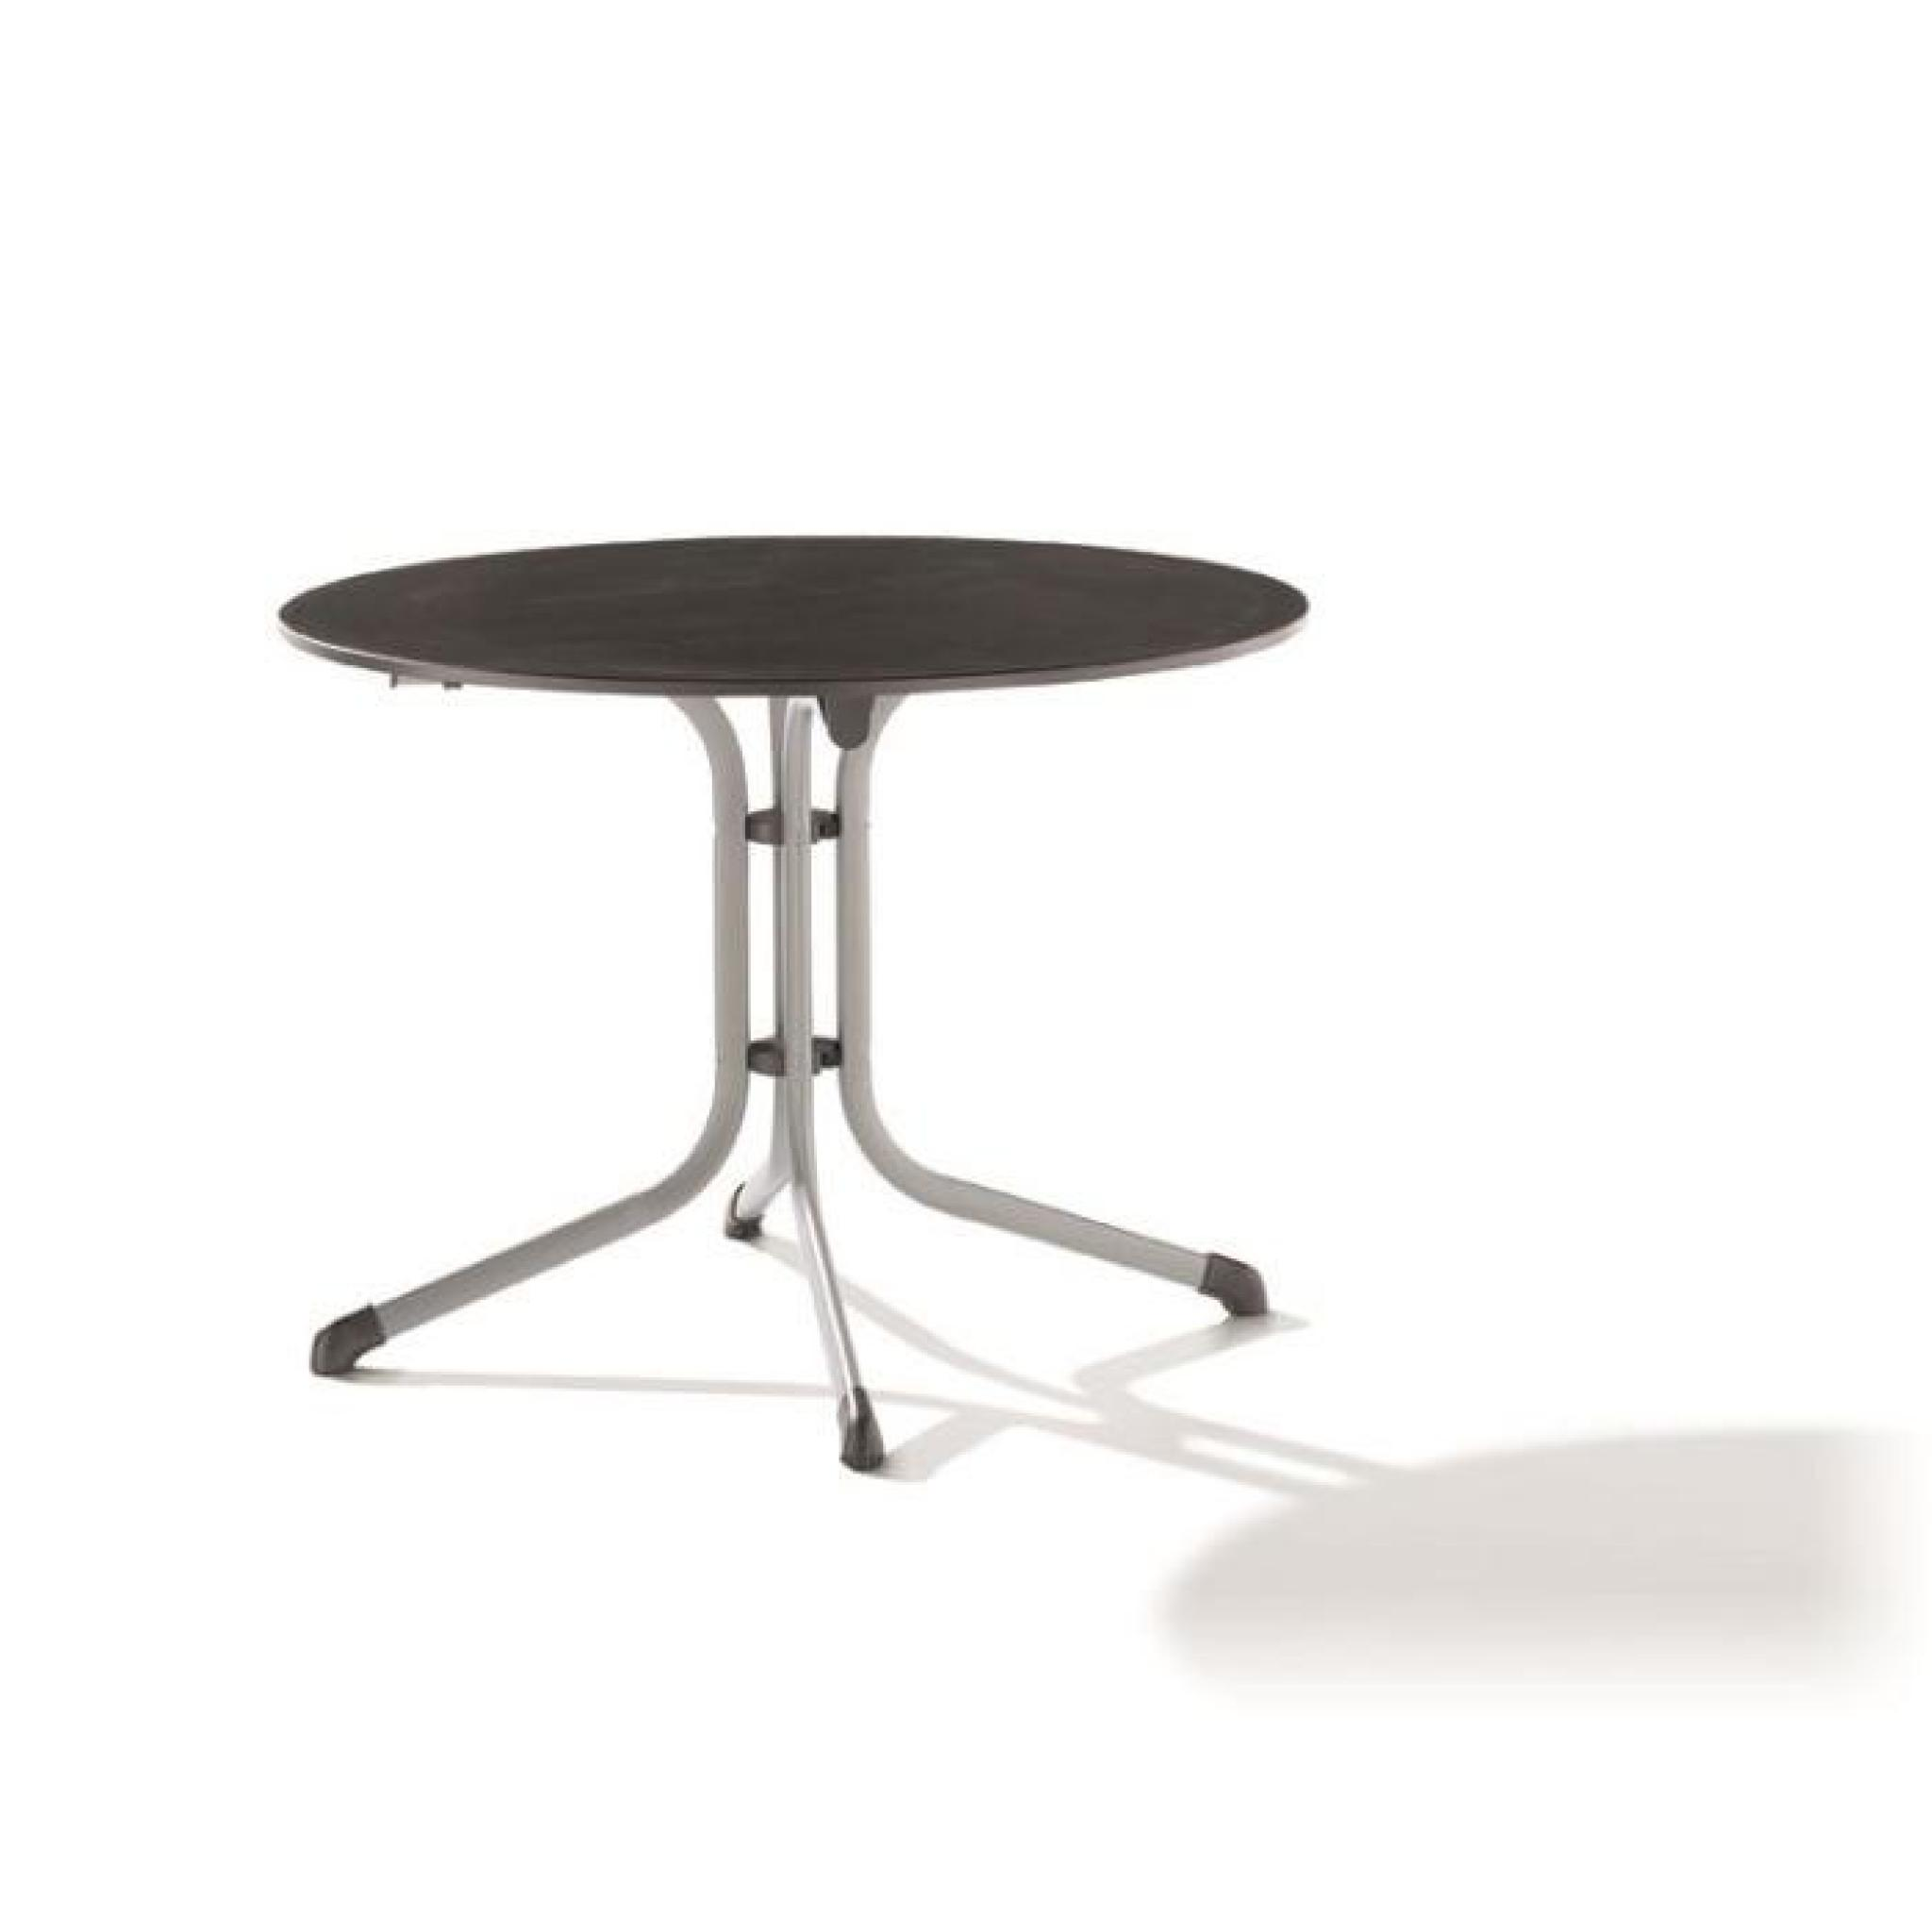 Table ronde puroplan pied tube en acier achat vente for Table ronde pas cher